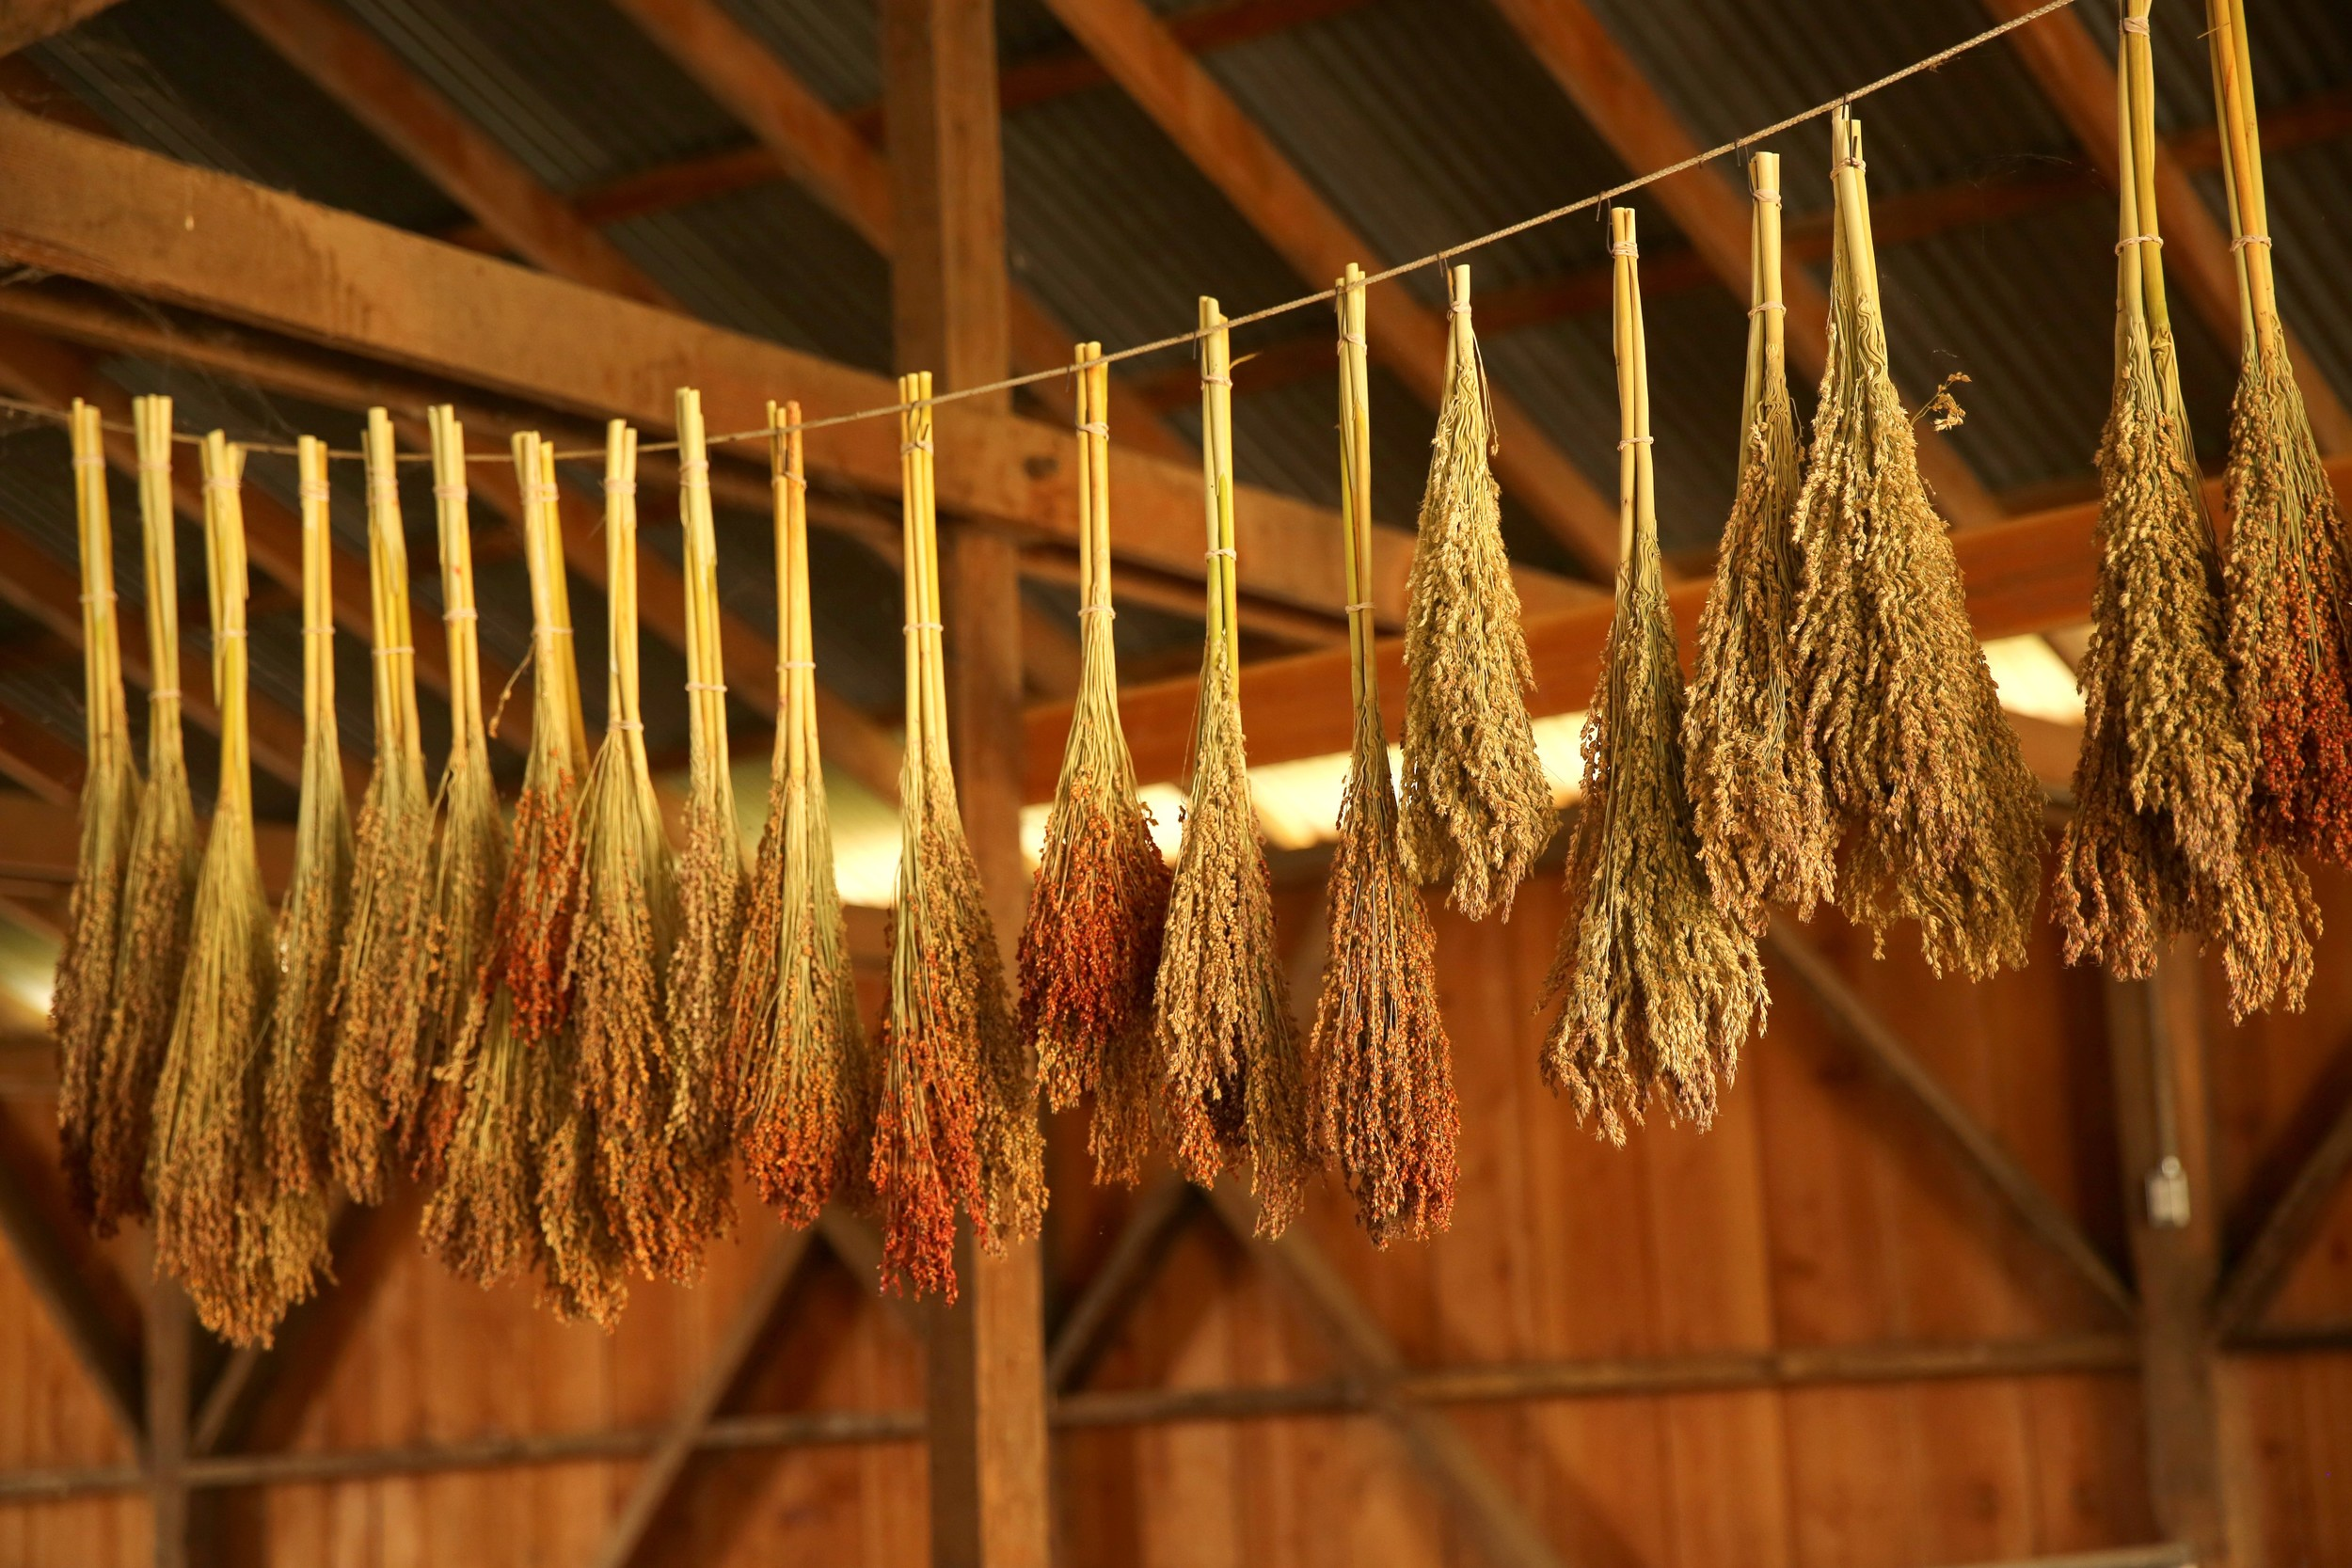 Broom corn drying in the large hay barn